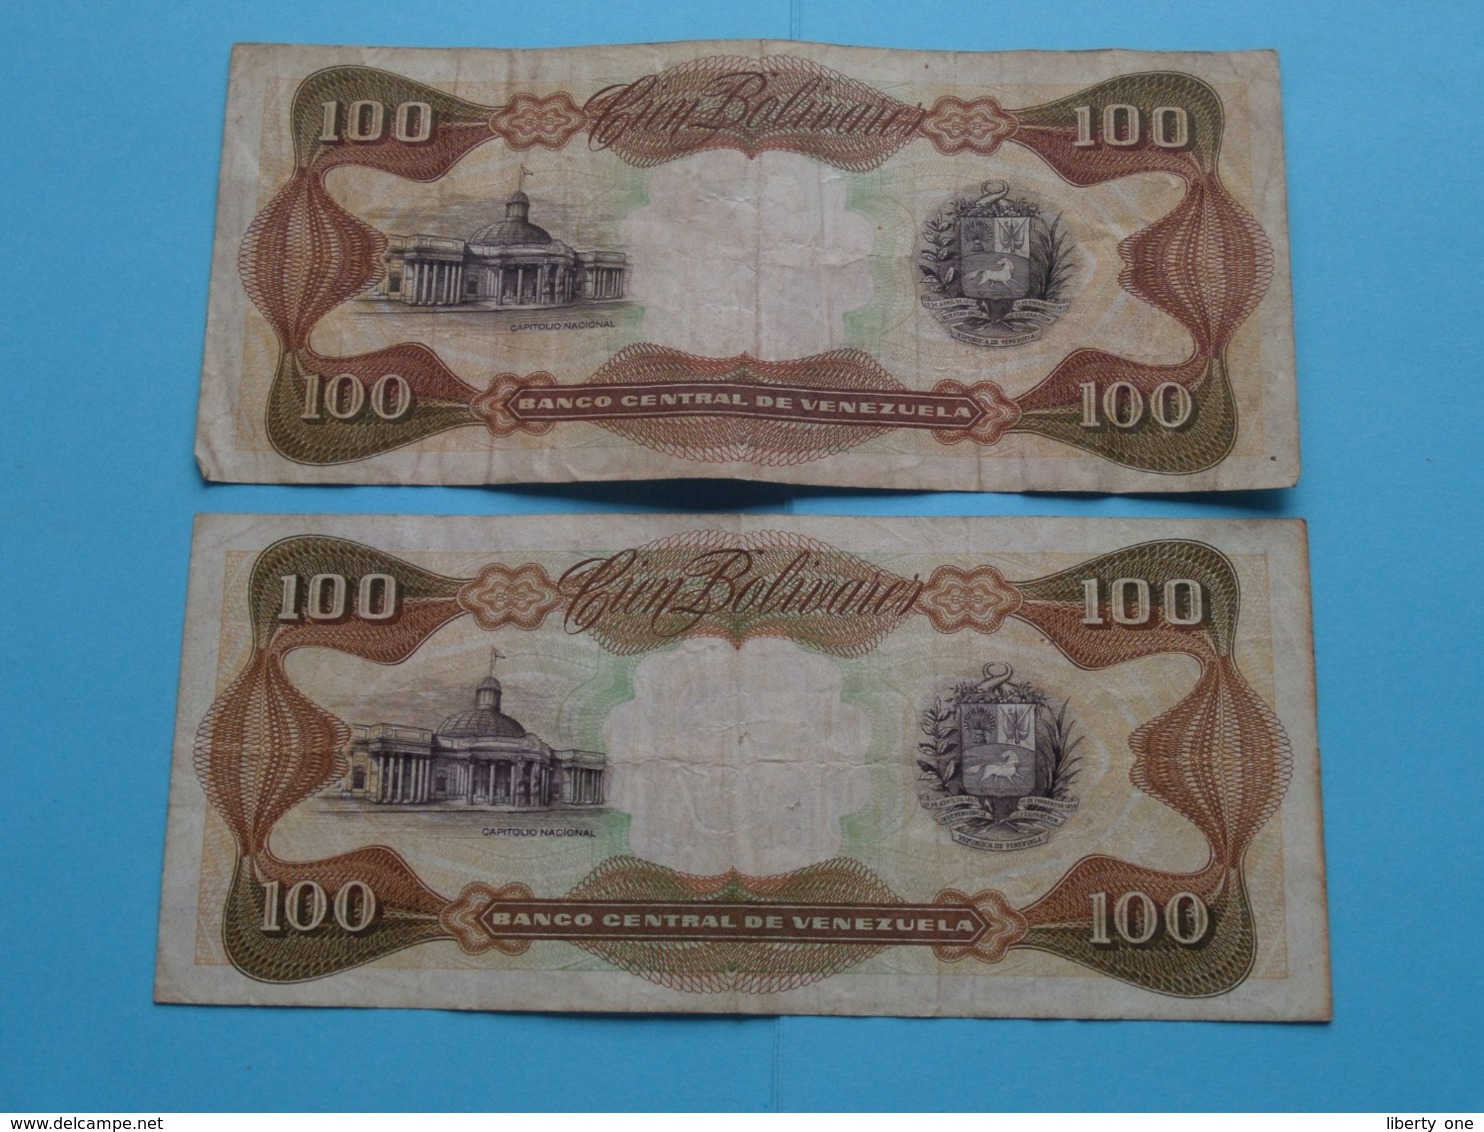 2 X 100 Bolivares Cien ( H59454846 & V35119080 ) 1992 Banco Central De Venezuela ( For Grade, Please See Photo ) 2 Pcs. - Venezuela